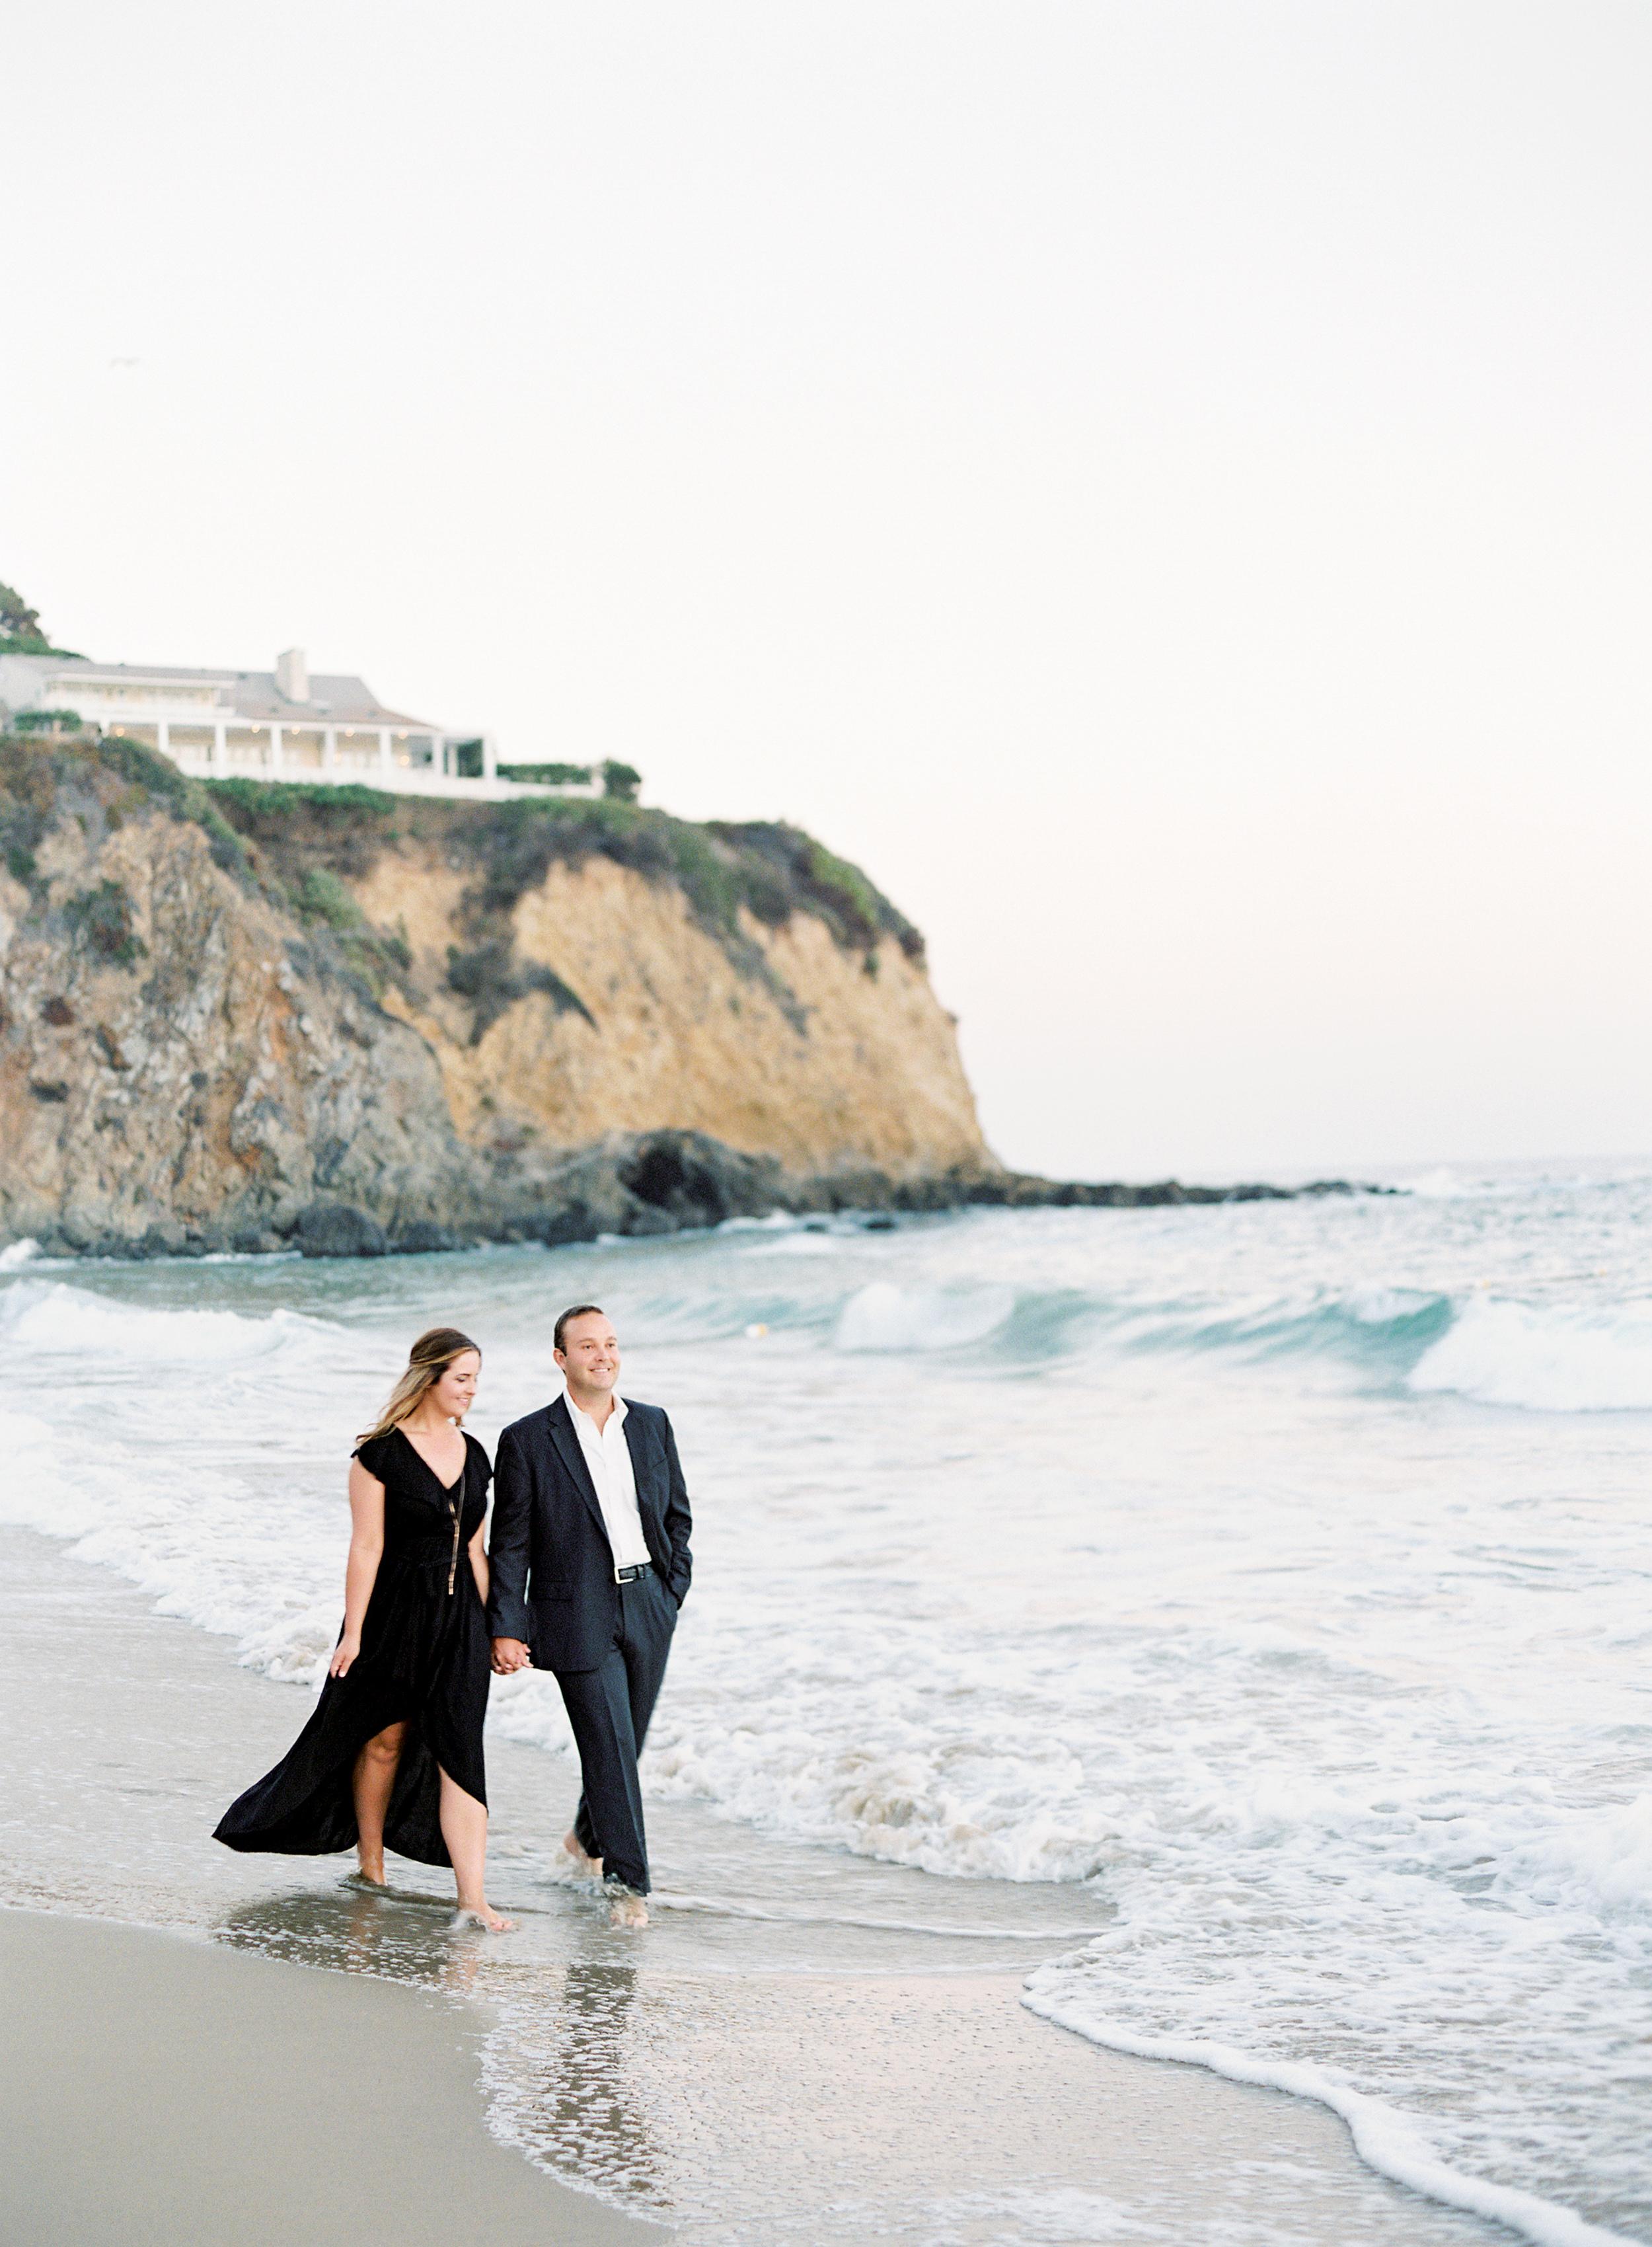 Laguna-Beach-Engagement-Film-Wedding-Orange-County-115.jpg